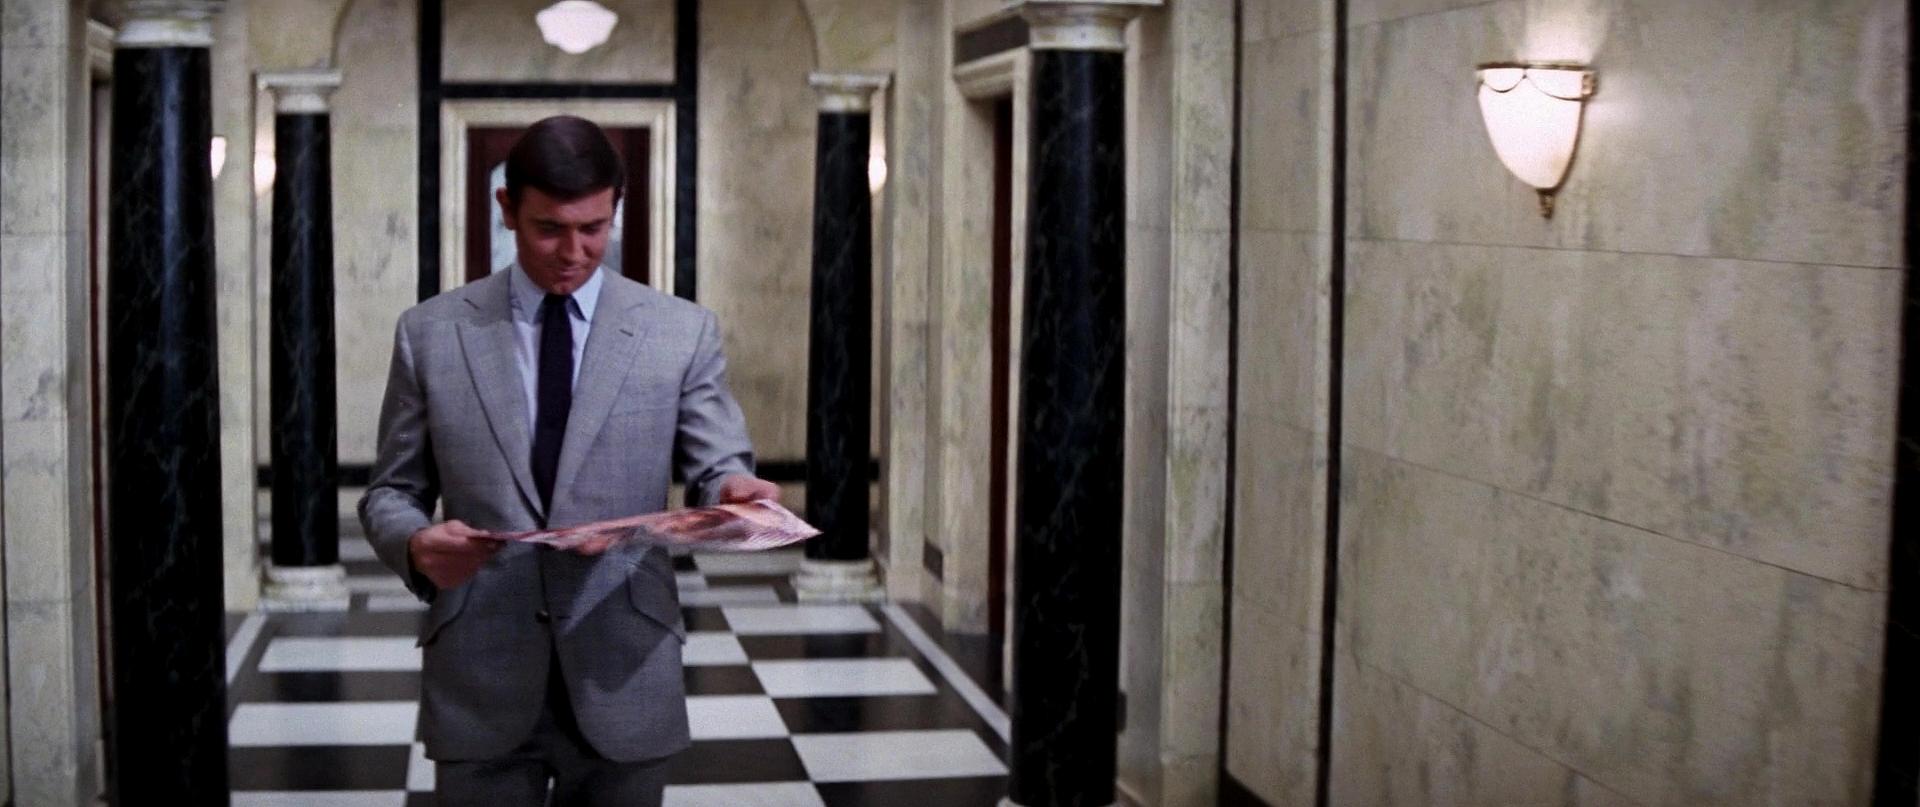 James Bond (George Lazenby) walking away with the centrefold photo © 1969 Metro-Goldwyn-Mayer Studios Inc., Danjaq, LLC and United Artists